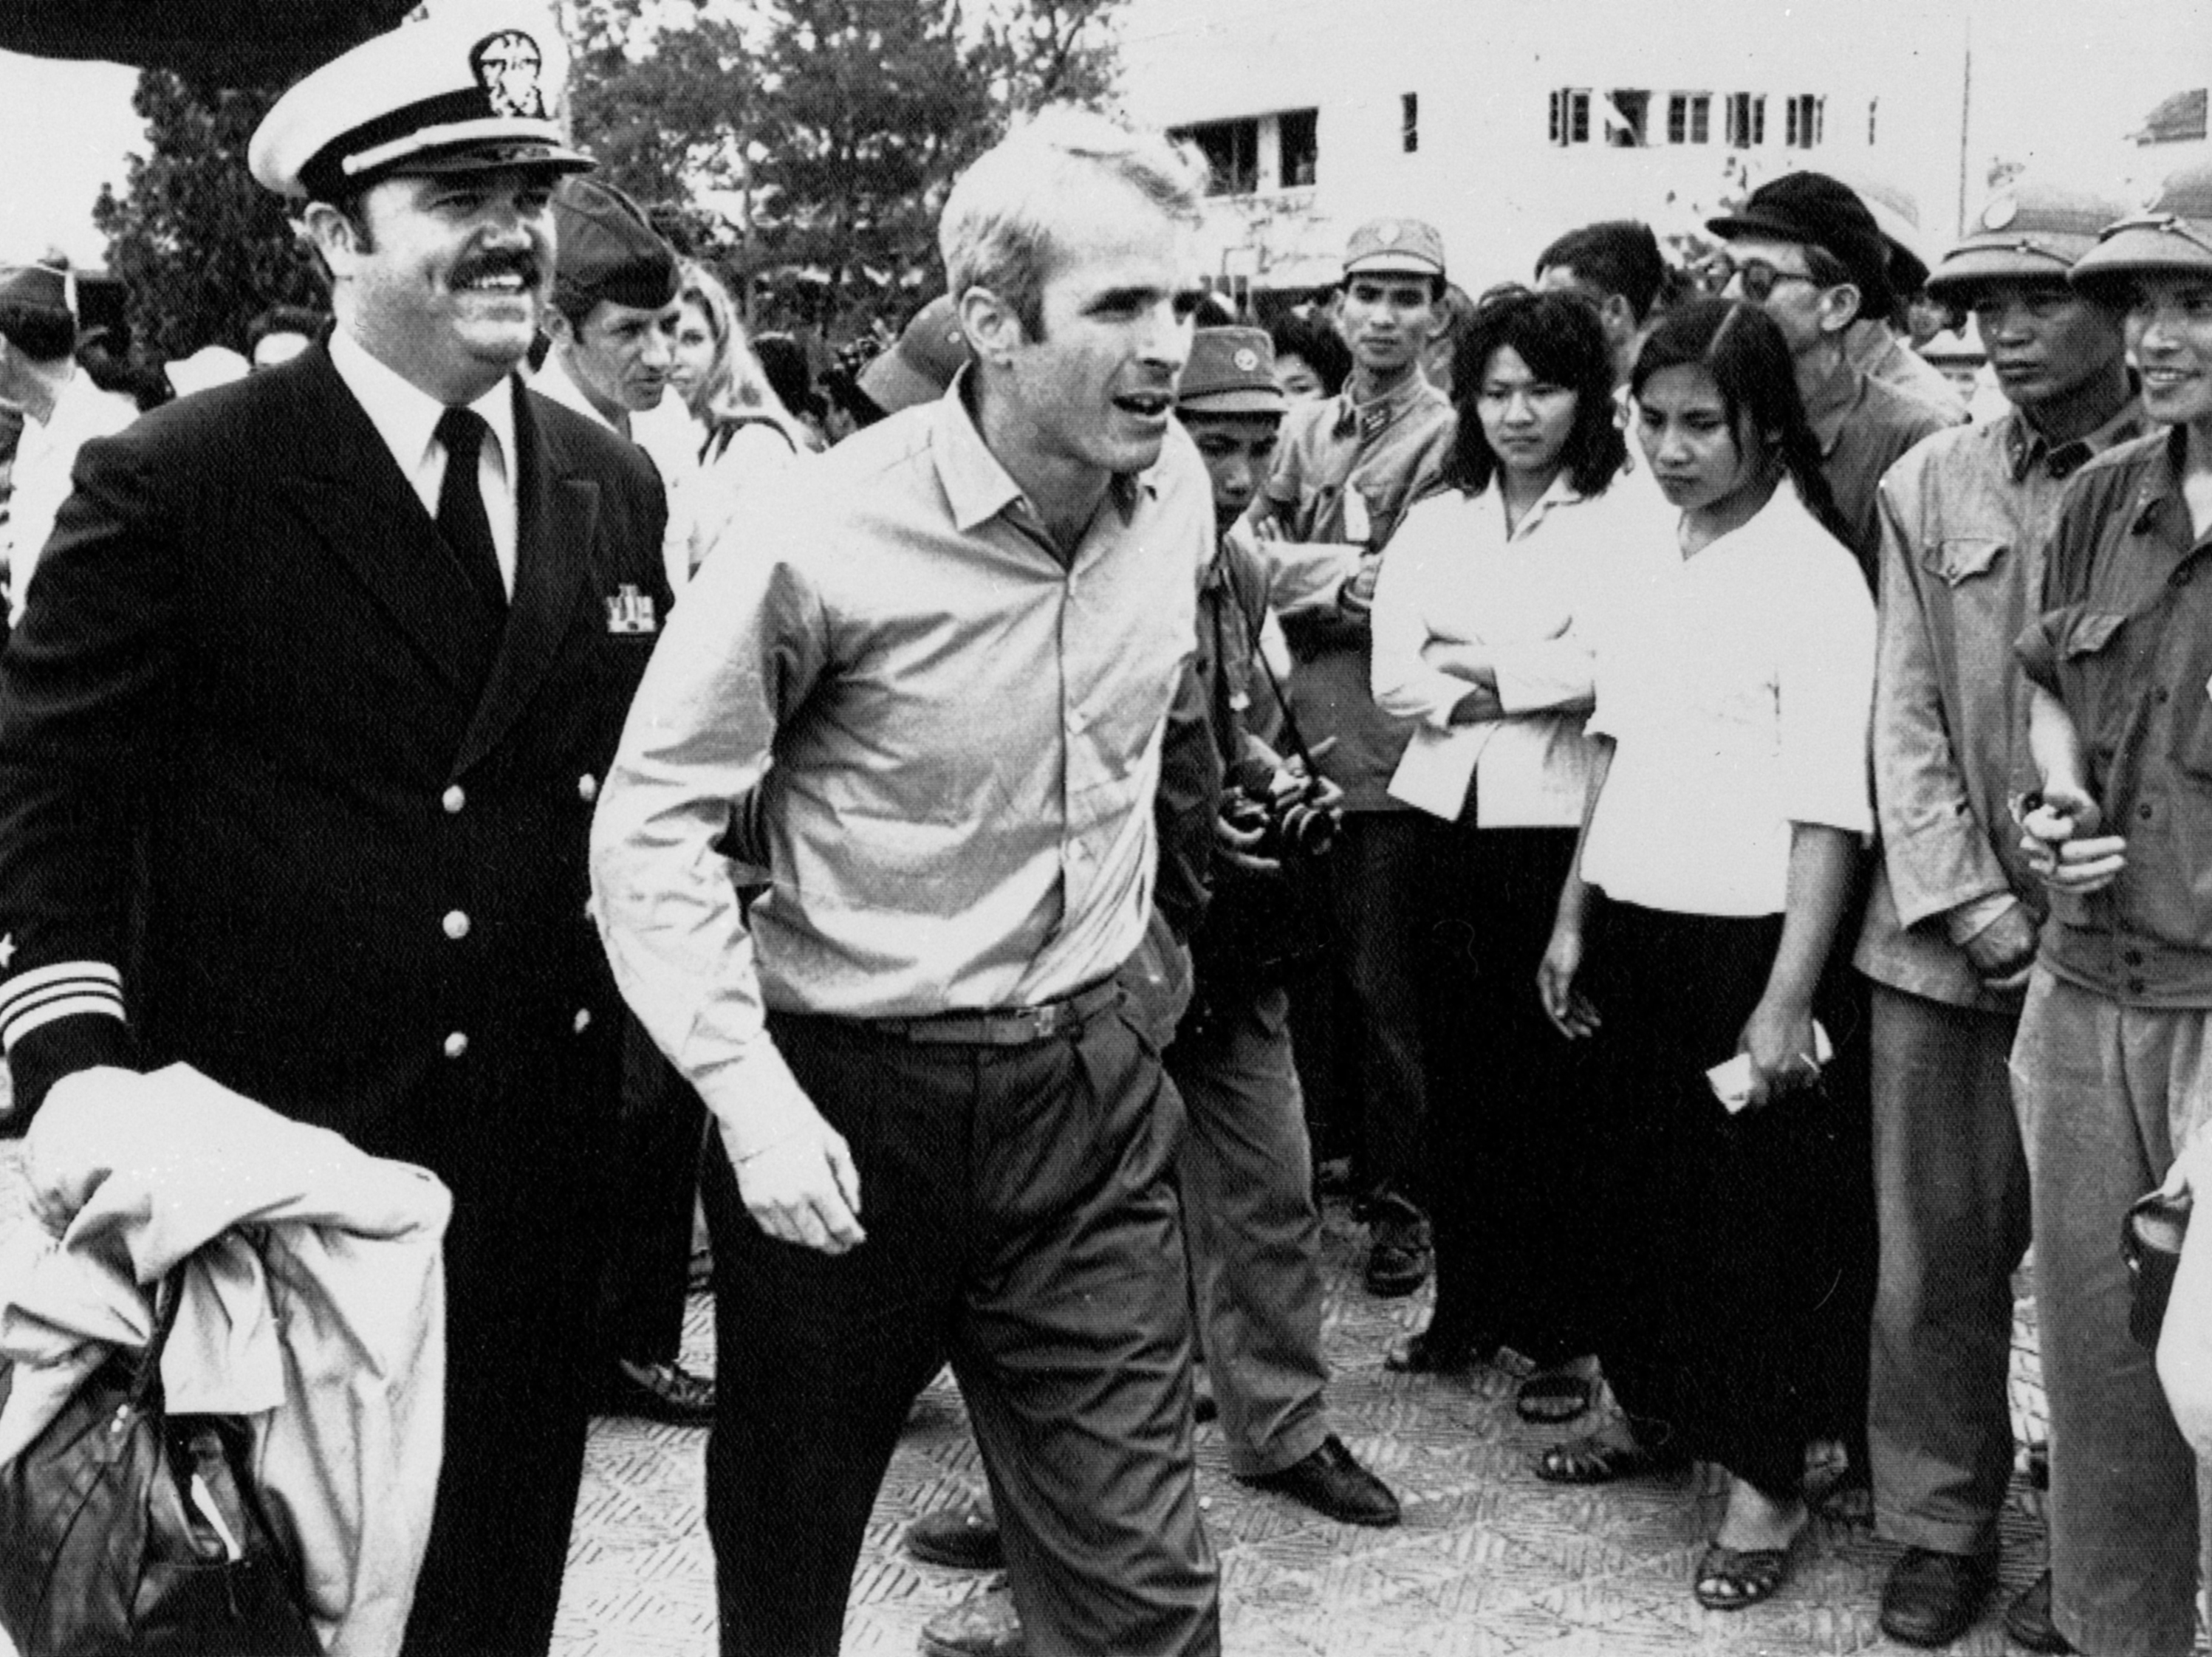 From A POW Prison, John McCain Emerged A 'Maverick' | NCPR News